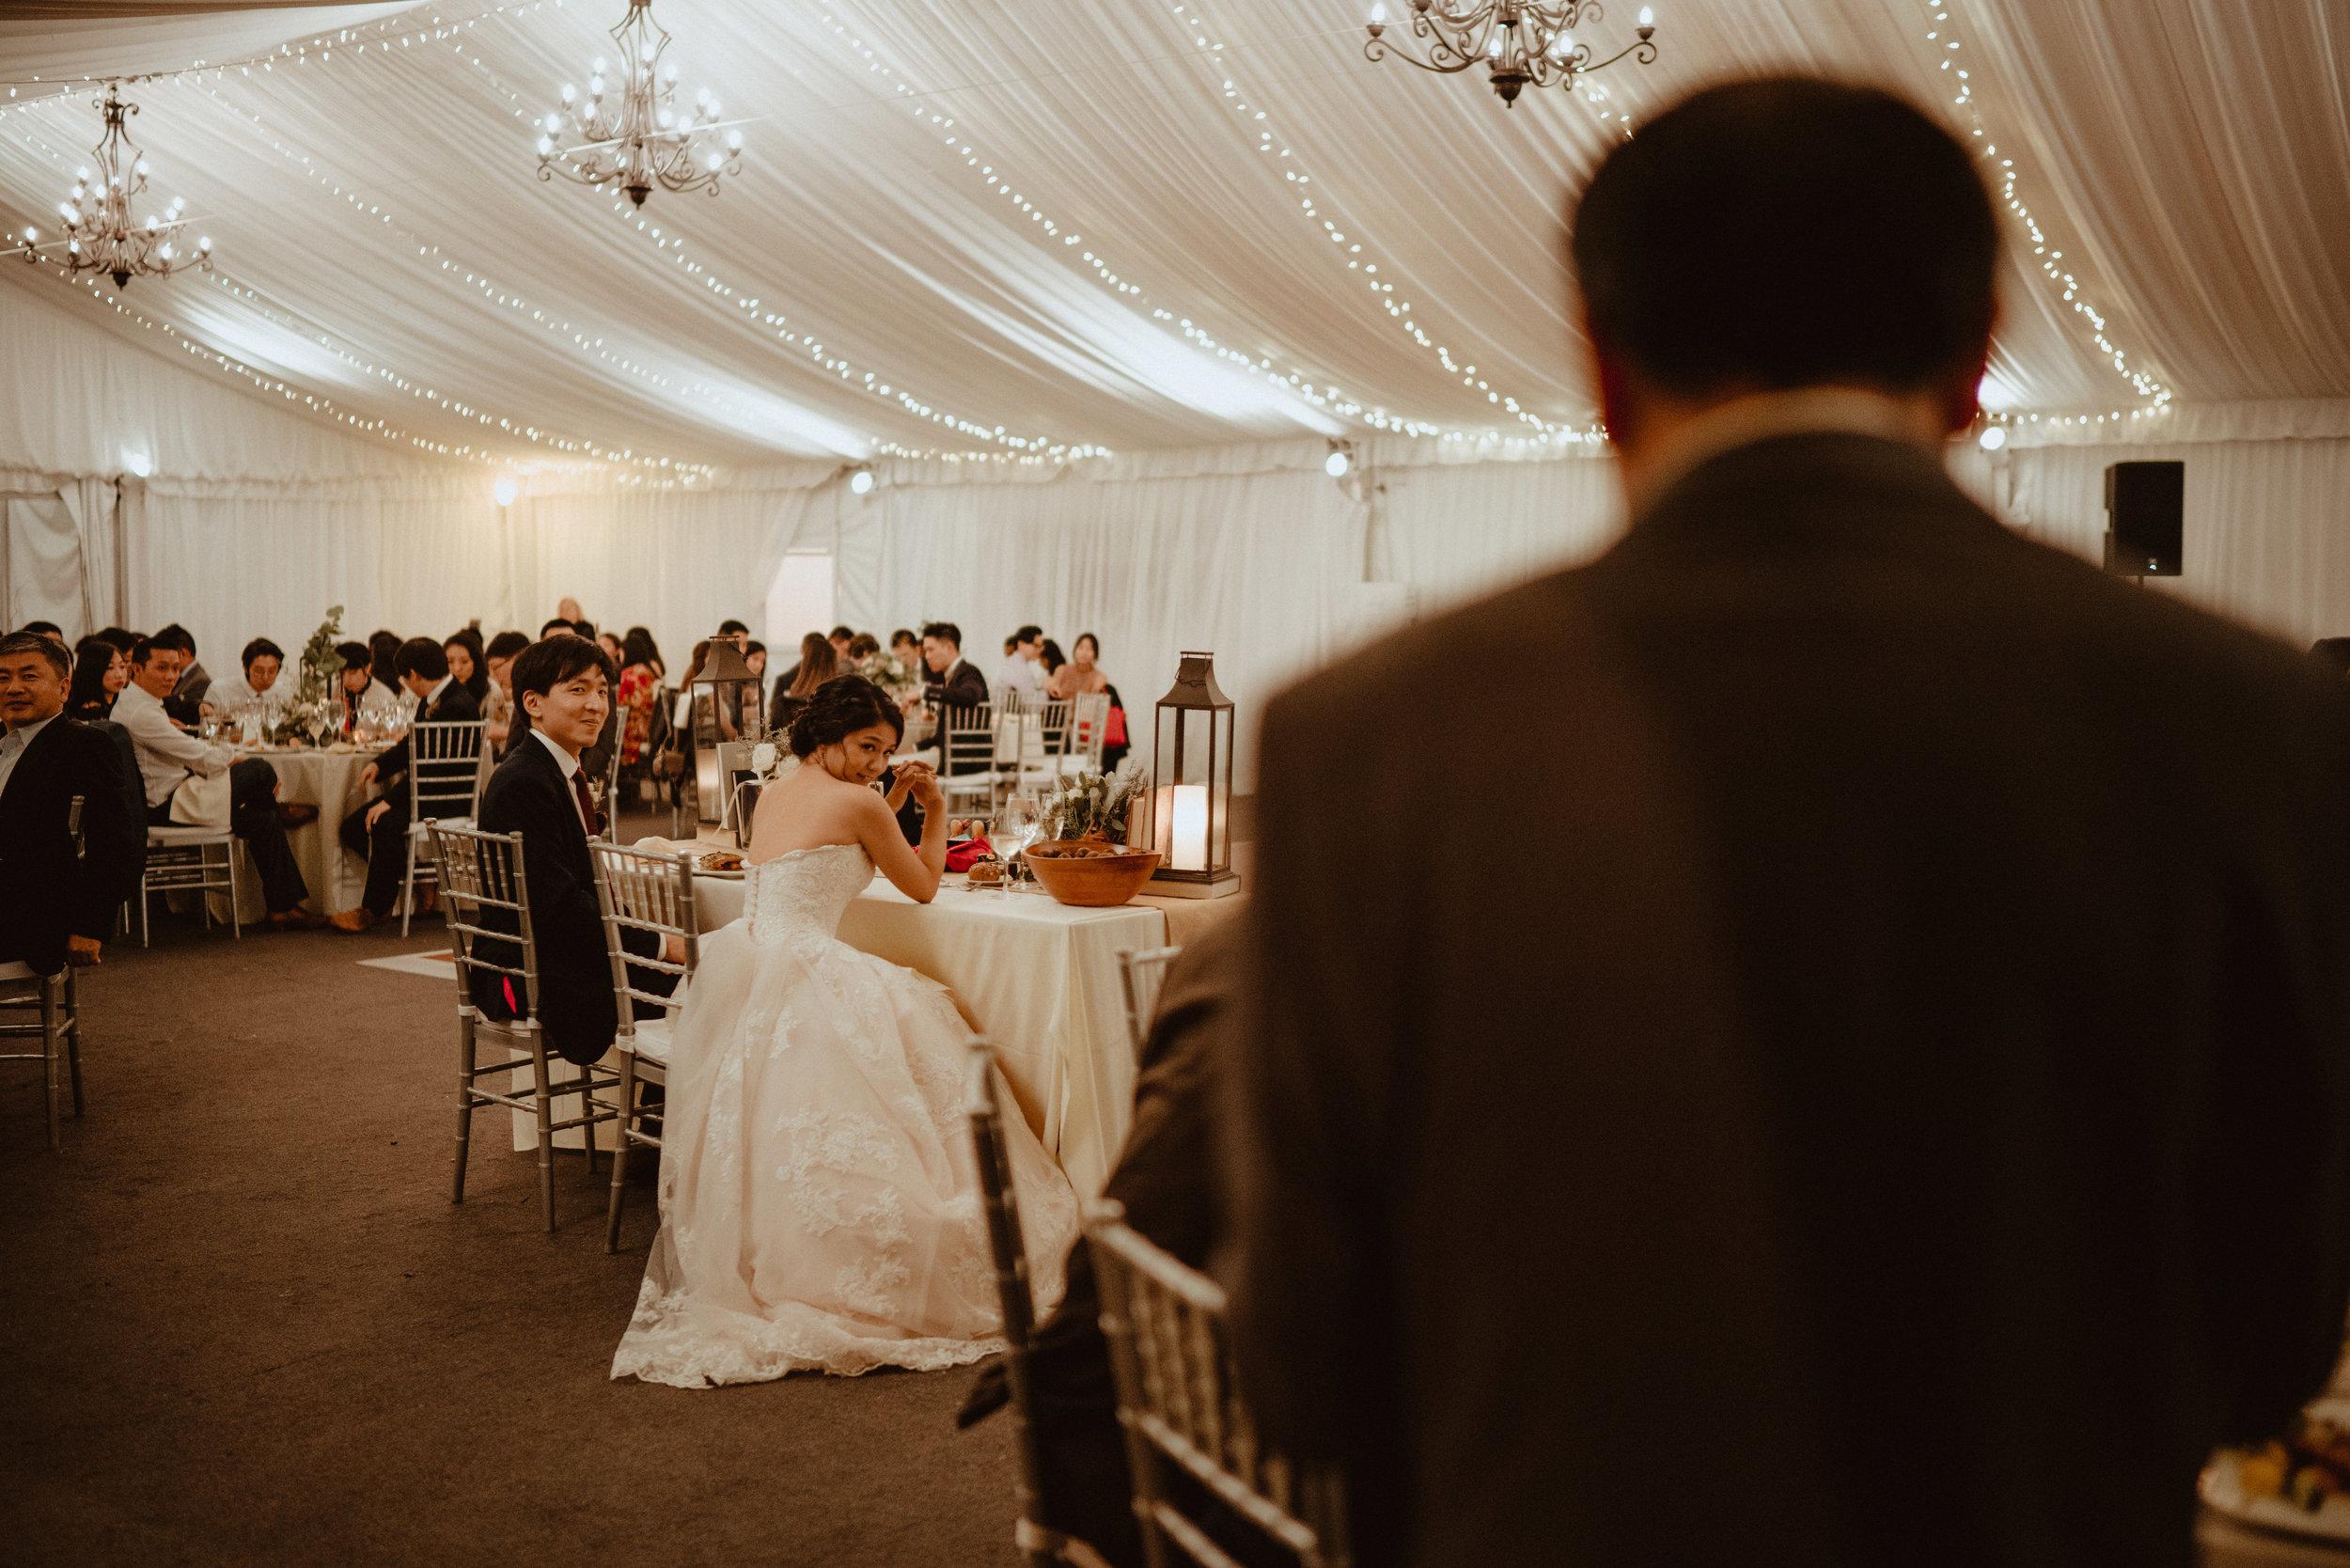 Irene-and-Jae-2019_Brooklyn_Wedding_Photographer_Chellise_Michael_Photography--118.jpg